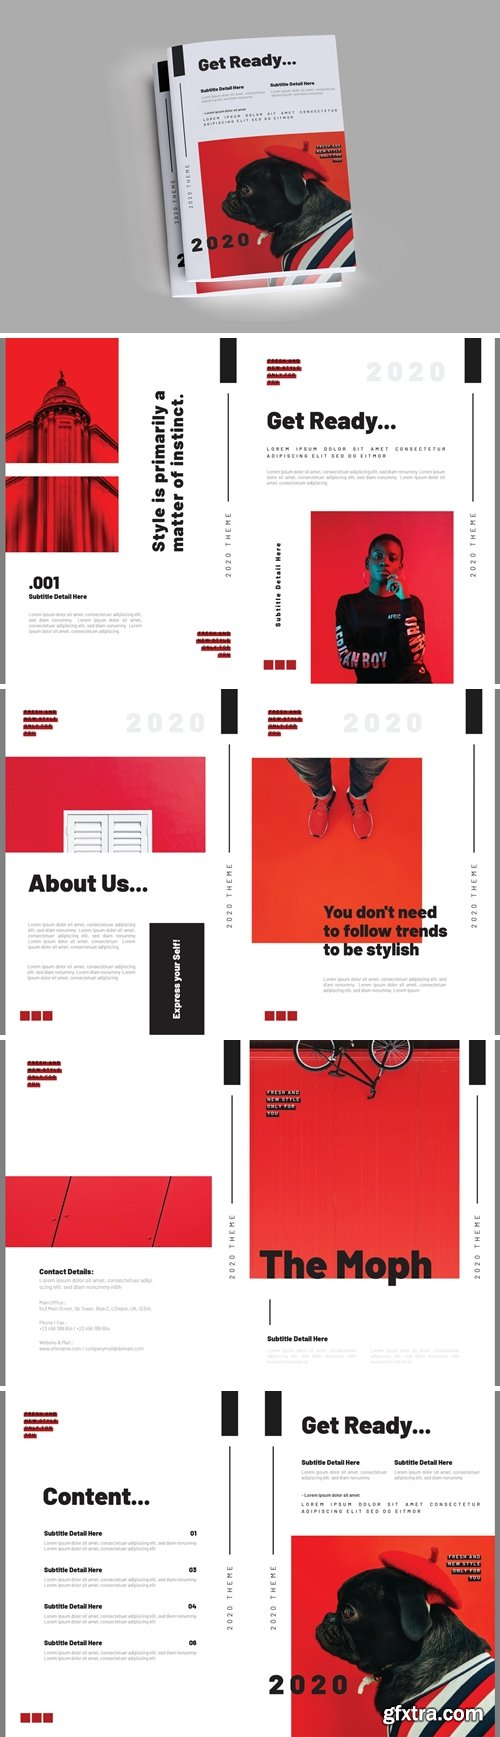 The Morph Brochure Template